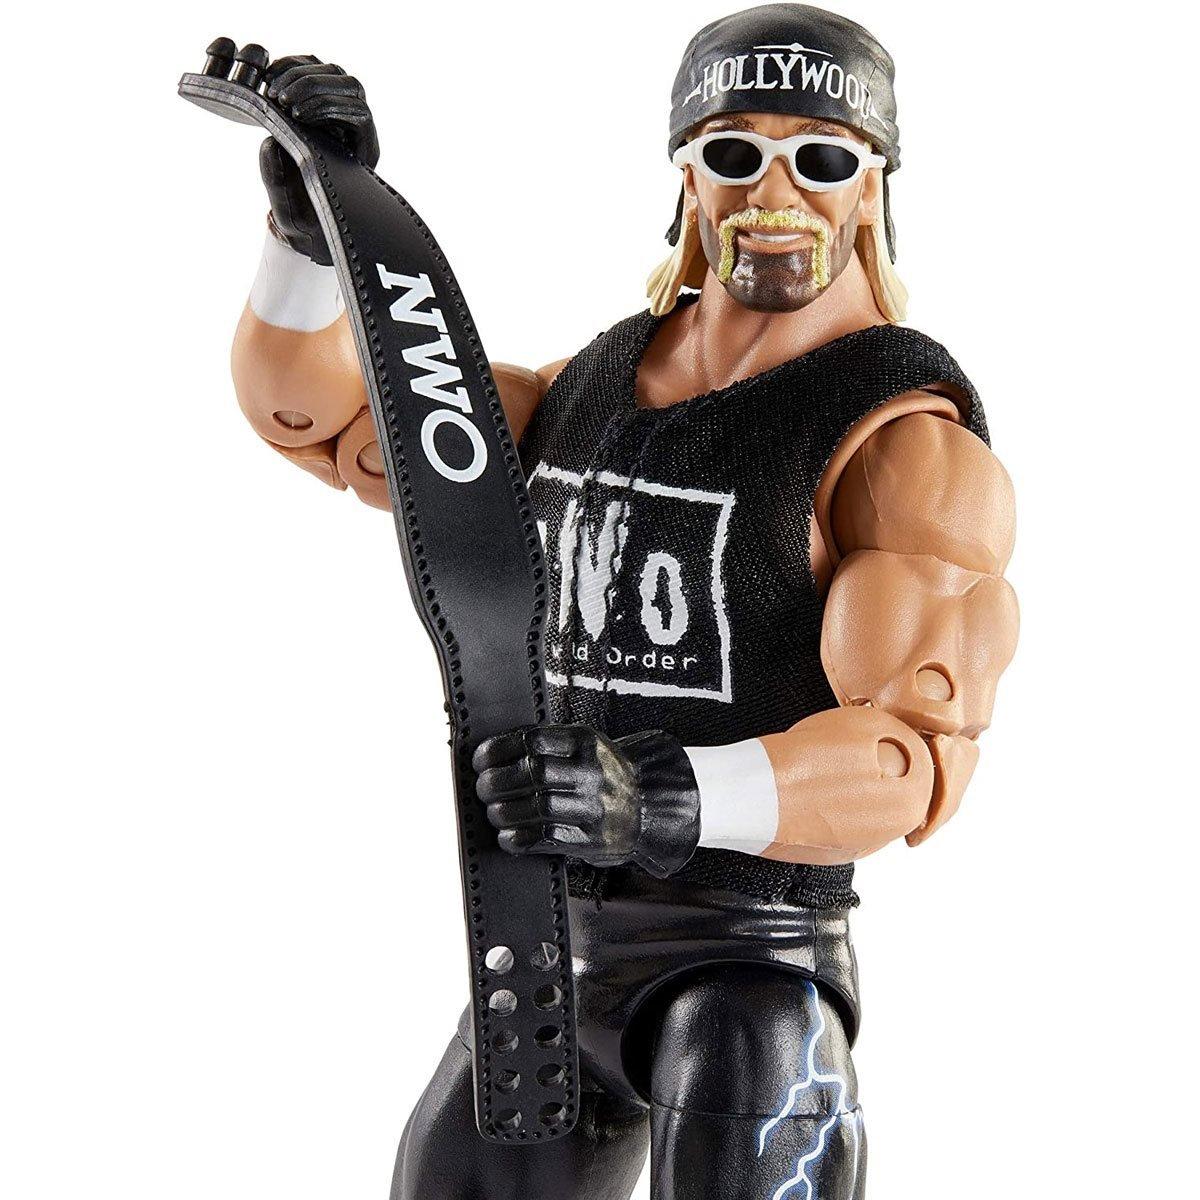 WWE Ultimate Edition Wave 7 Hollywood Hulk Hogan Action Figure-ReRun